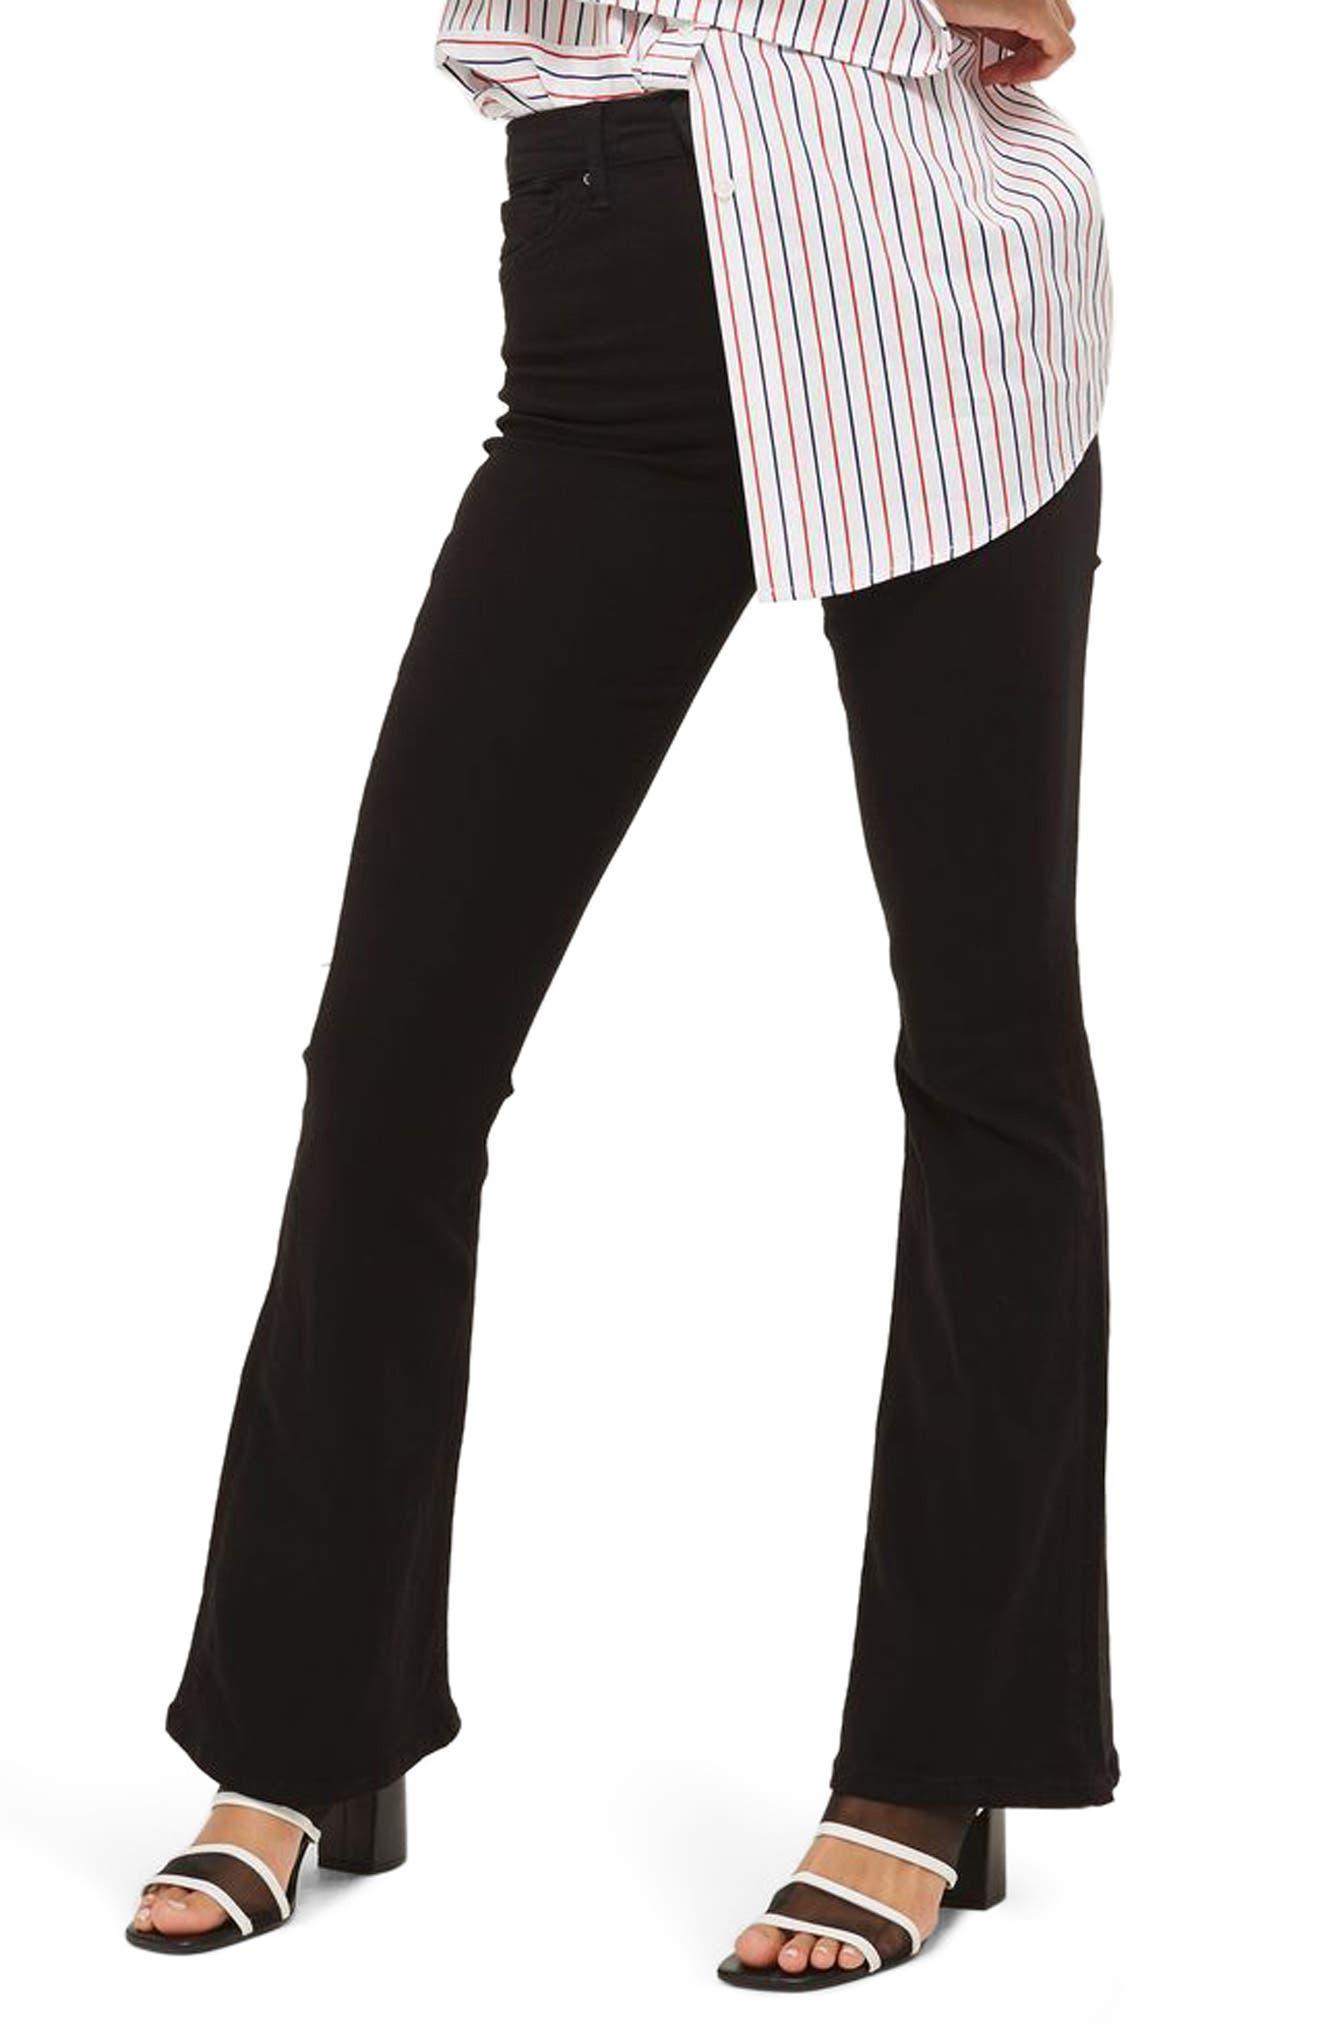 Jamie High Waist Flare Jeans,                             Main thumbnail 1, color,                             Black